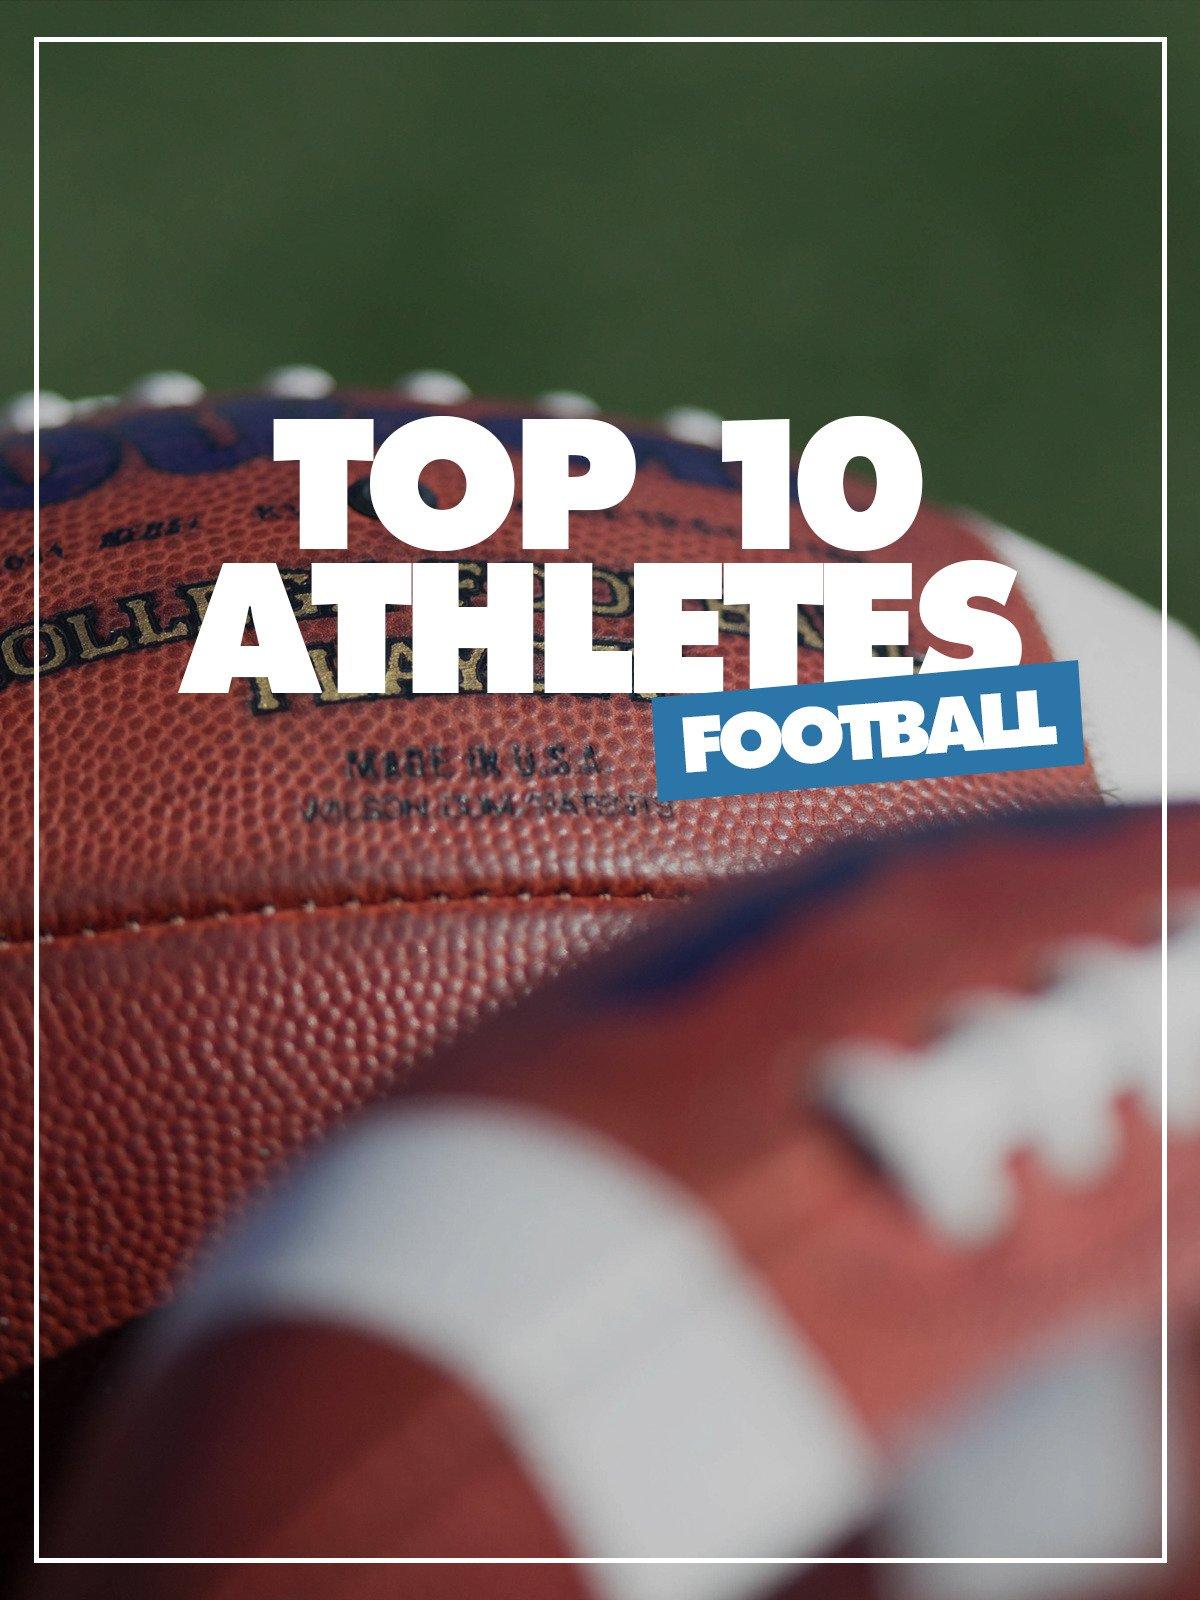 Top 10 Athletes Football on Amazon Prime Video UK